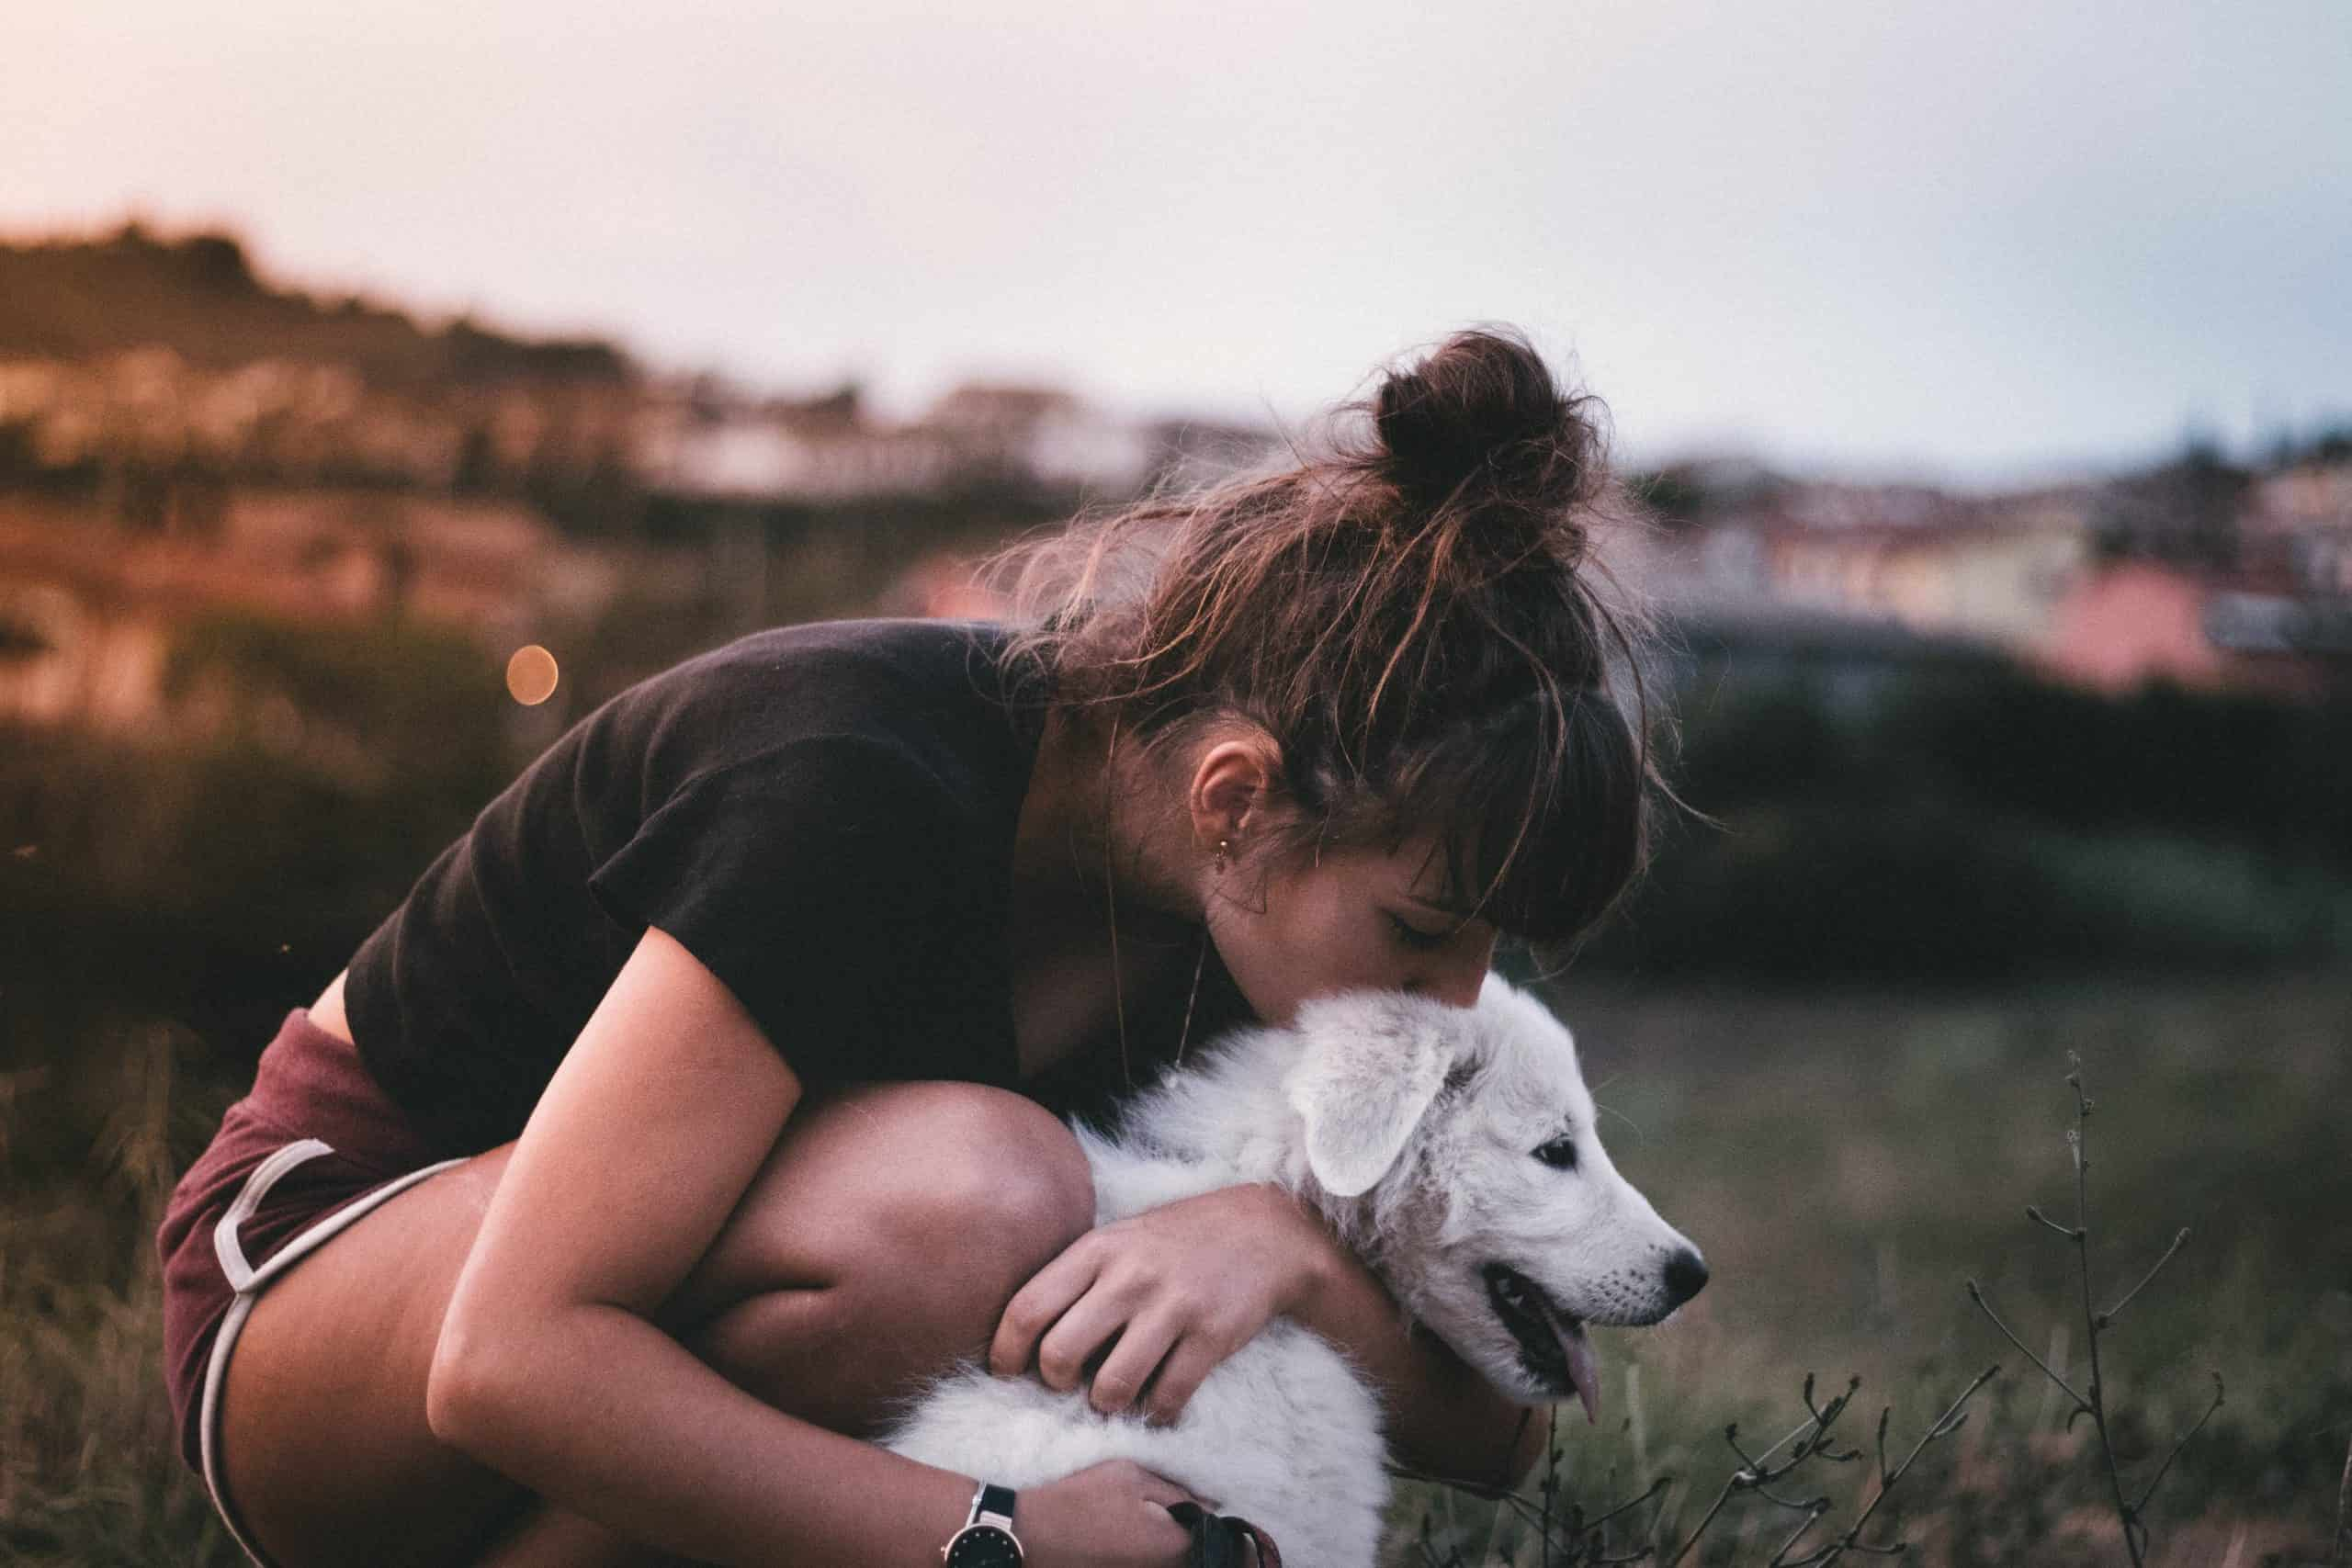 a girl hugging a dog